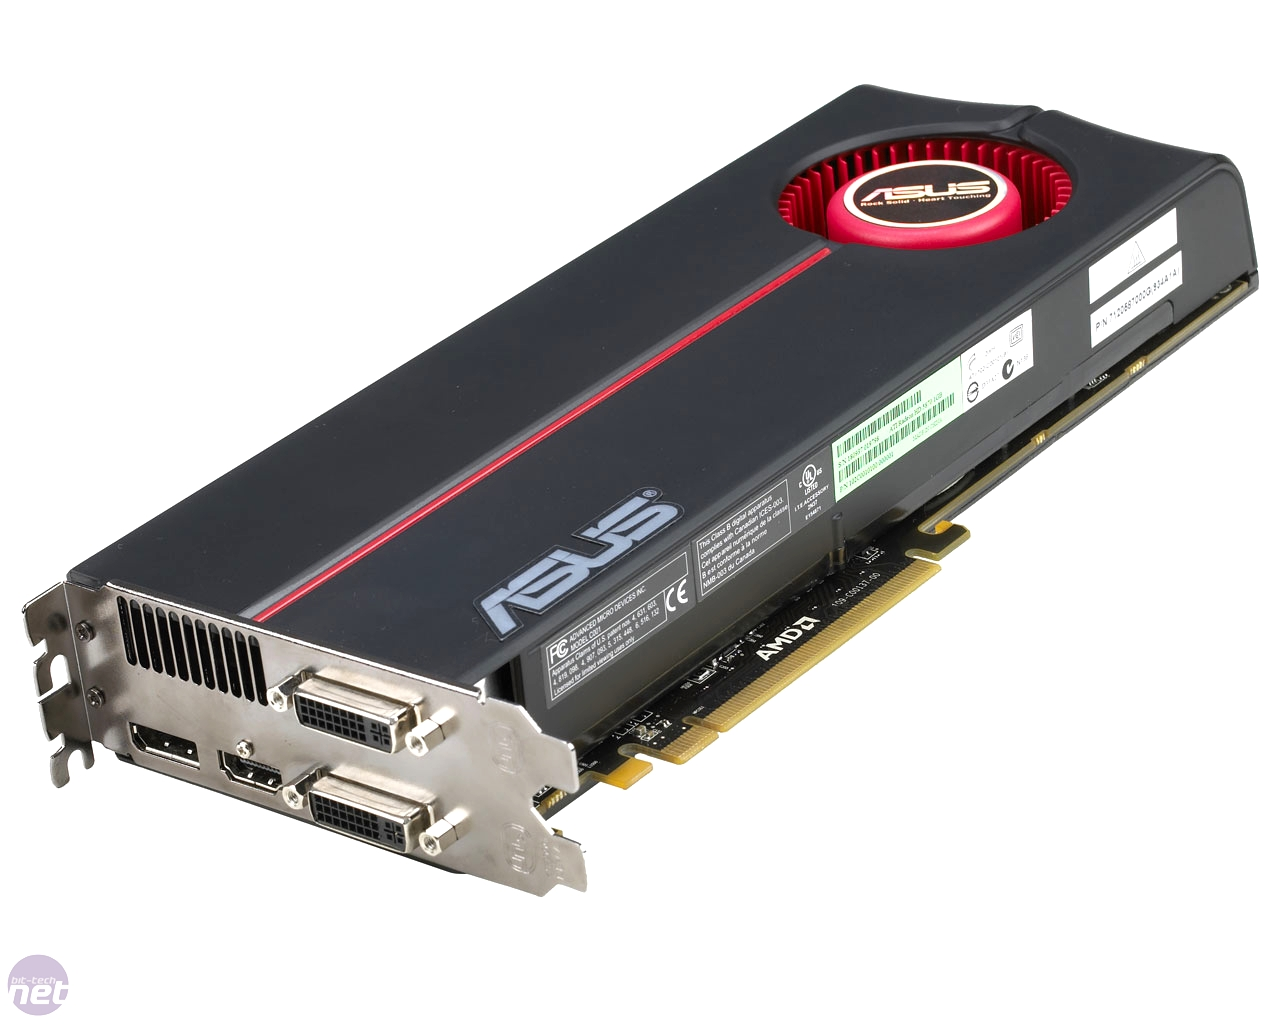 Asus Radeon Hd 5850 1Gb